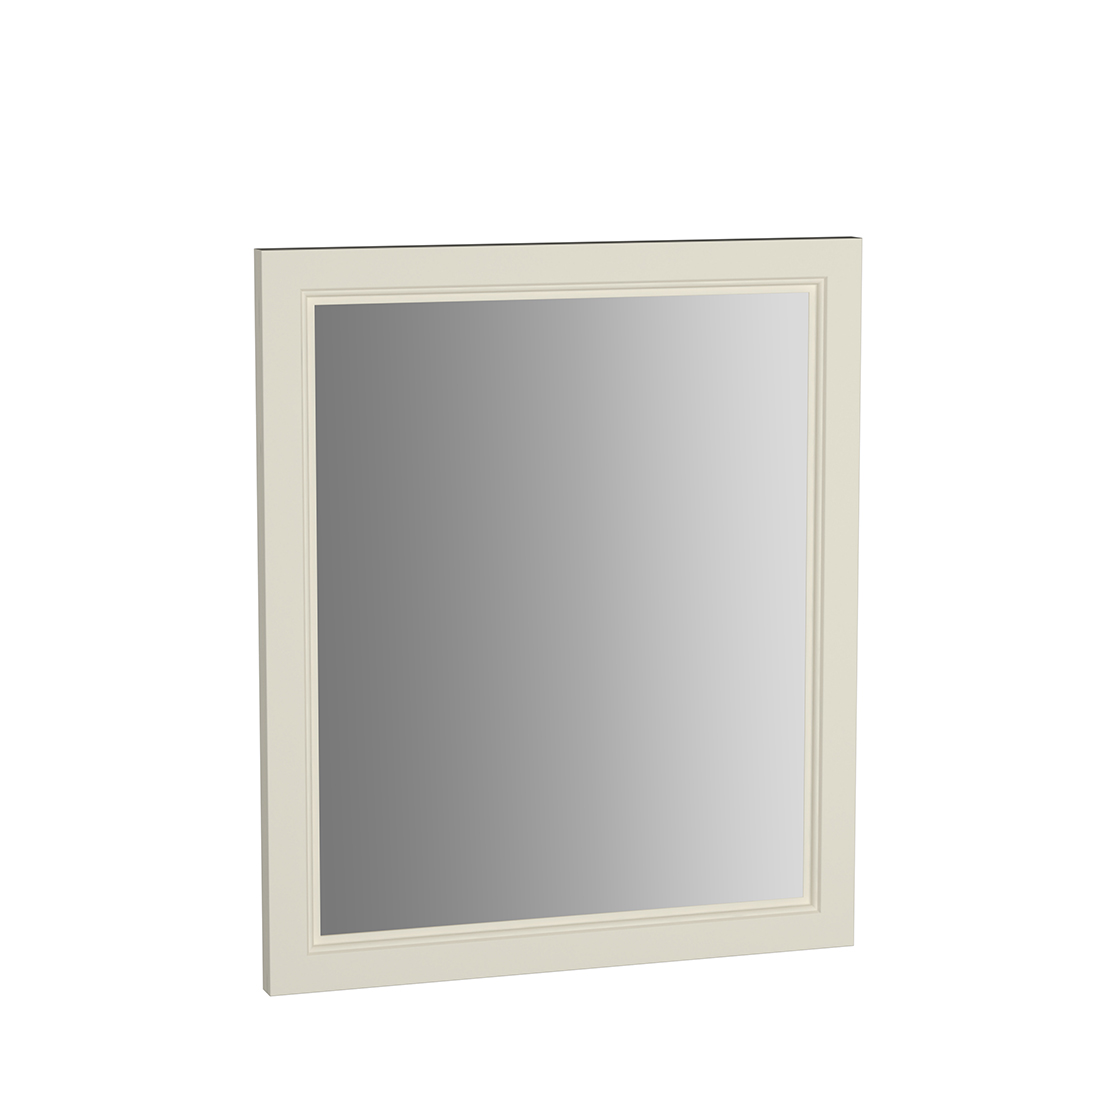 Valarte miroir, 65 cm, ivoire mat